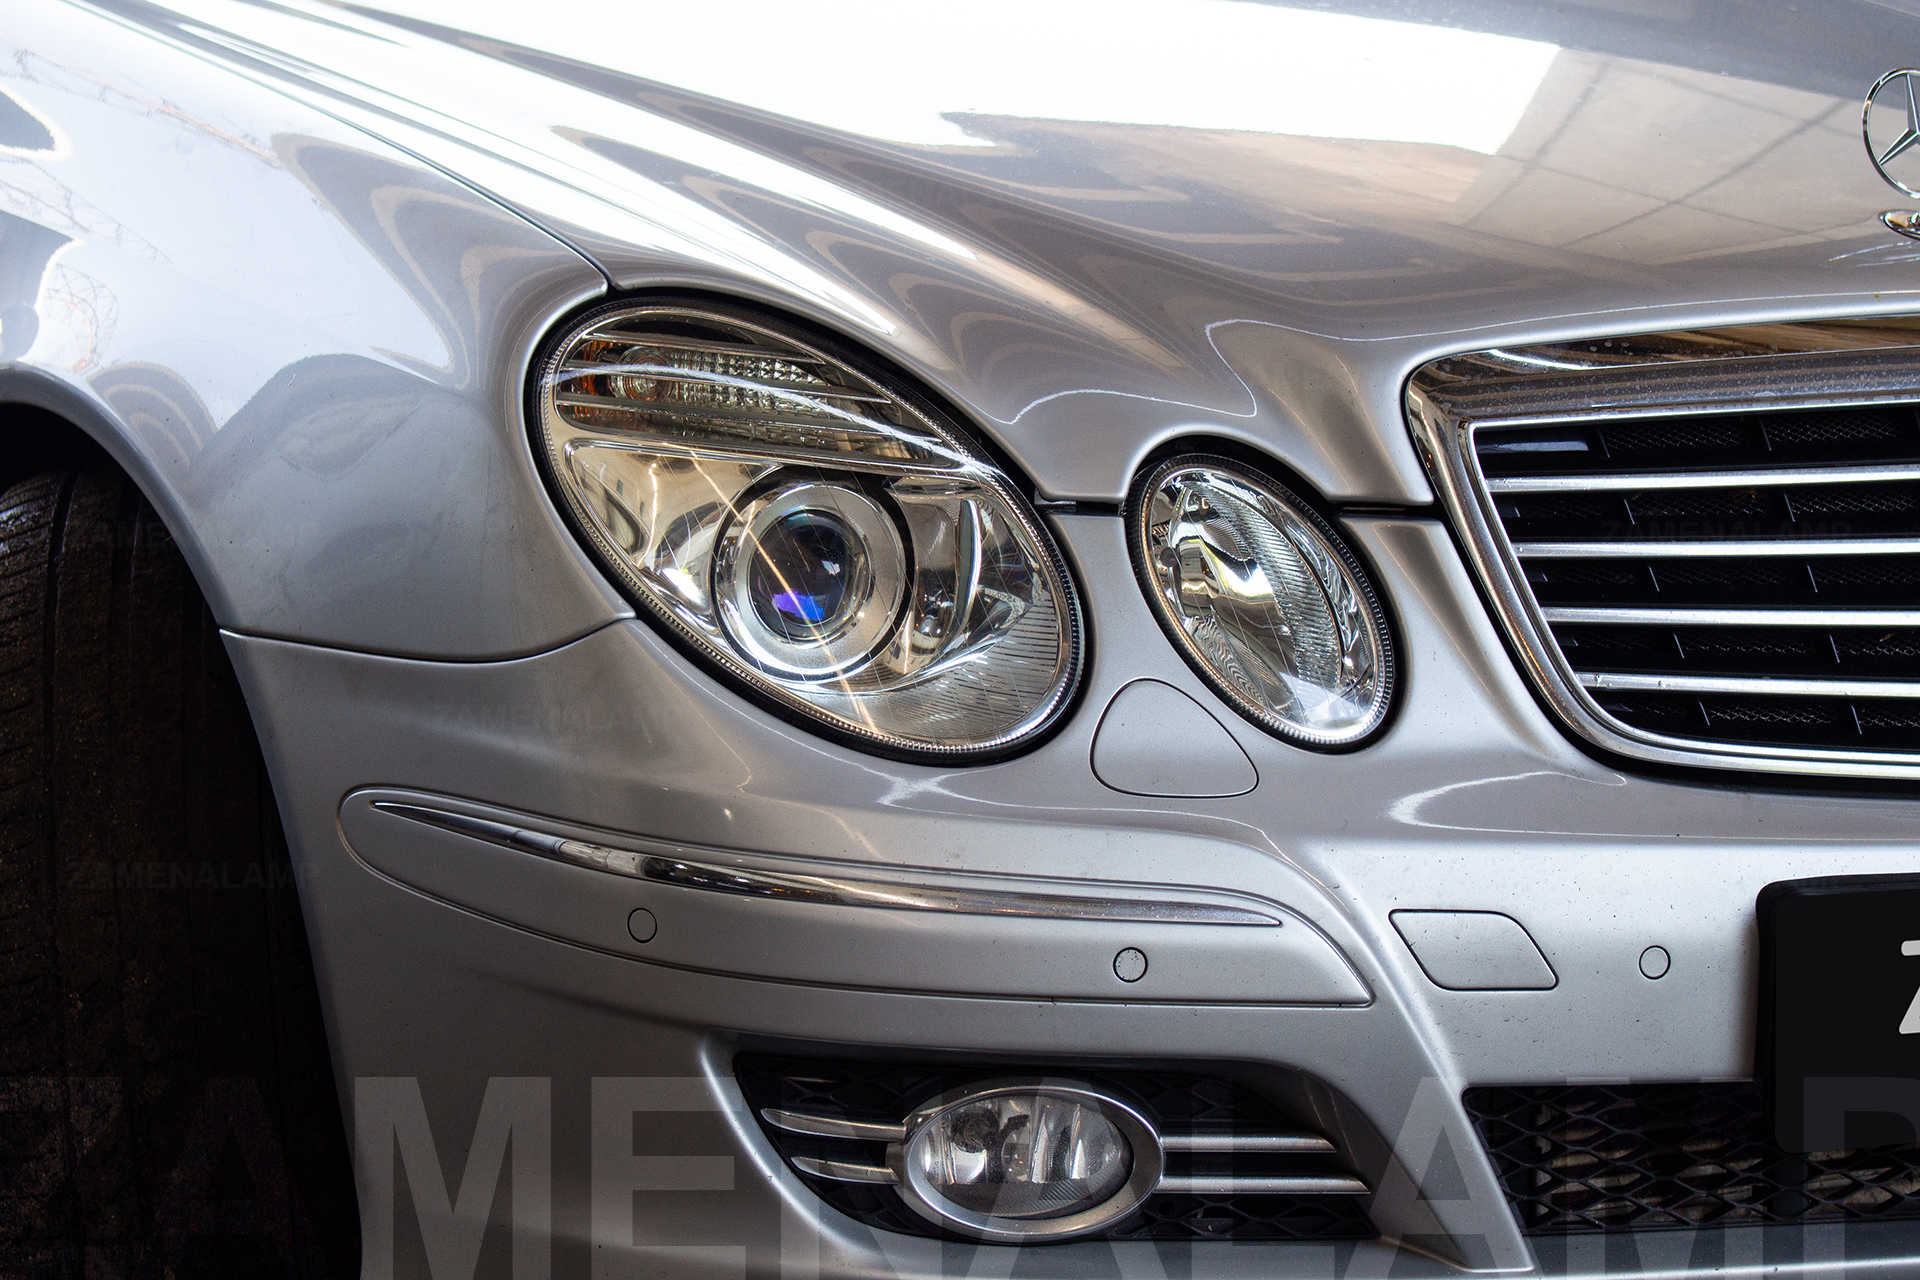 MERCEDES-BENZ W211 замена штатных линз на Hella 5 Blue